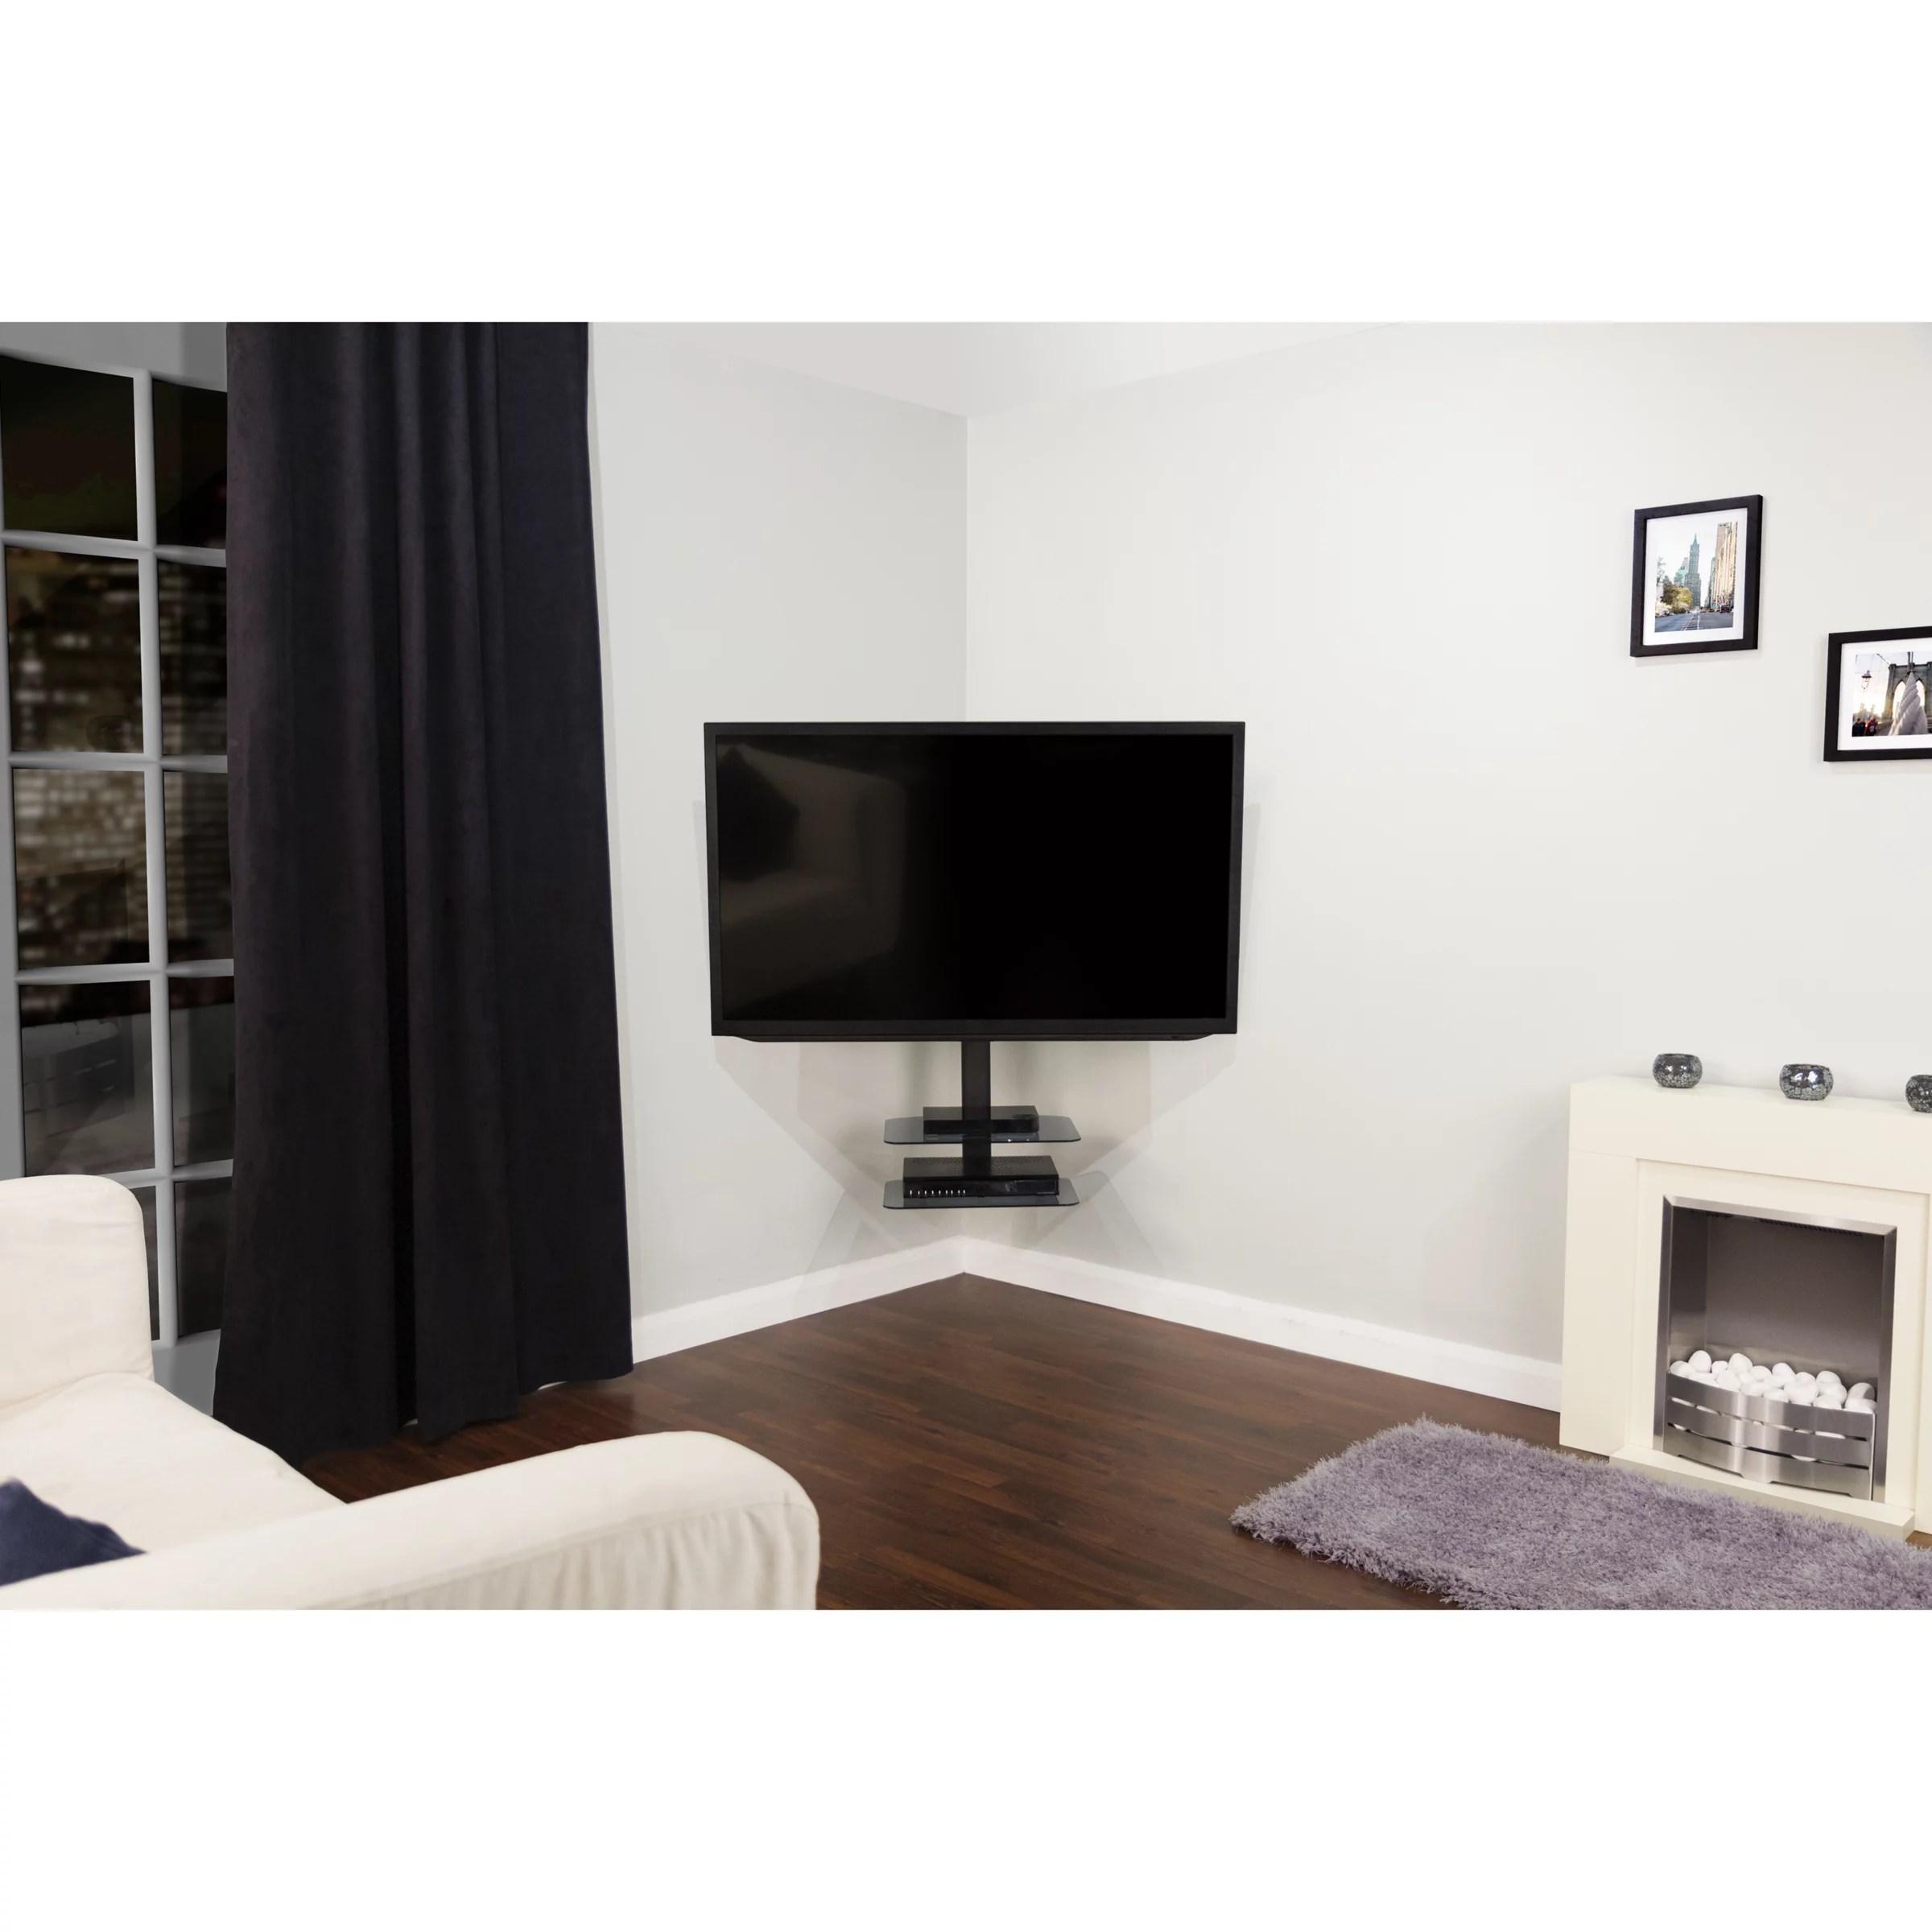 Avf Zsl5502 Multi Position Corner Wall Mount For Tvs From 32 70